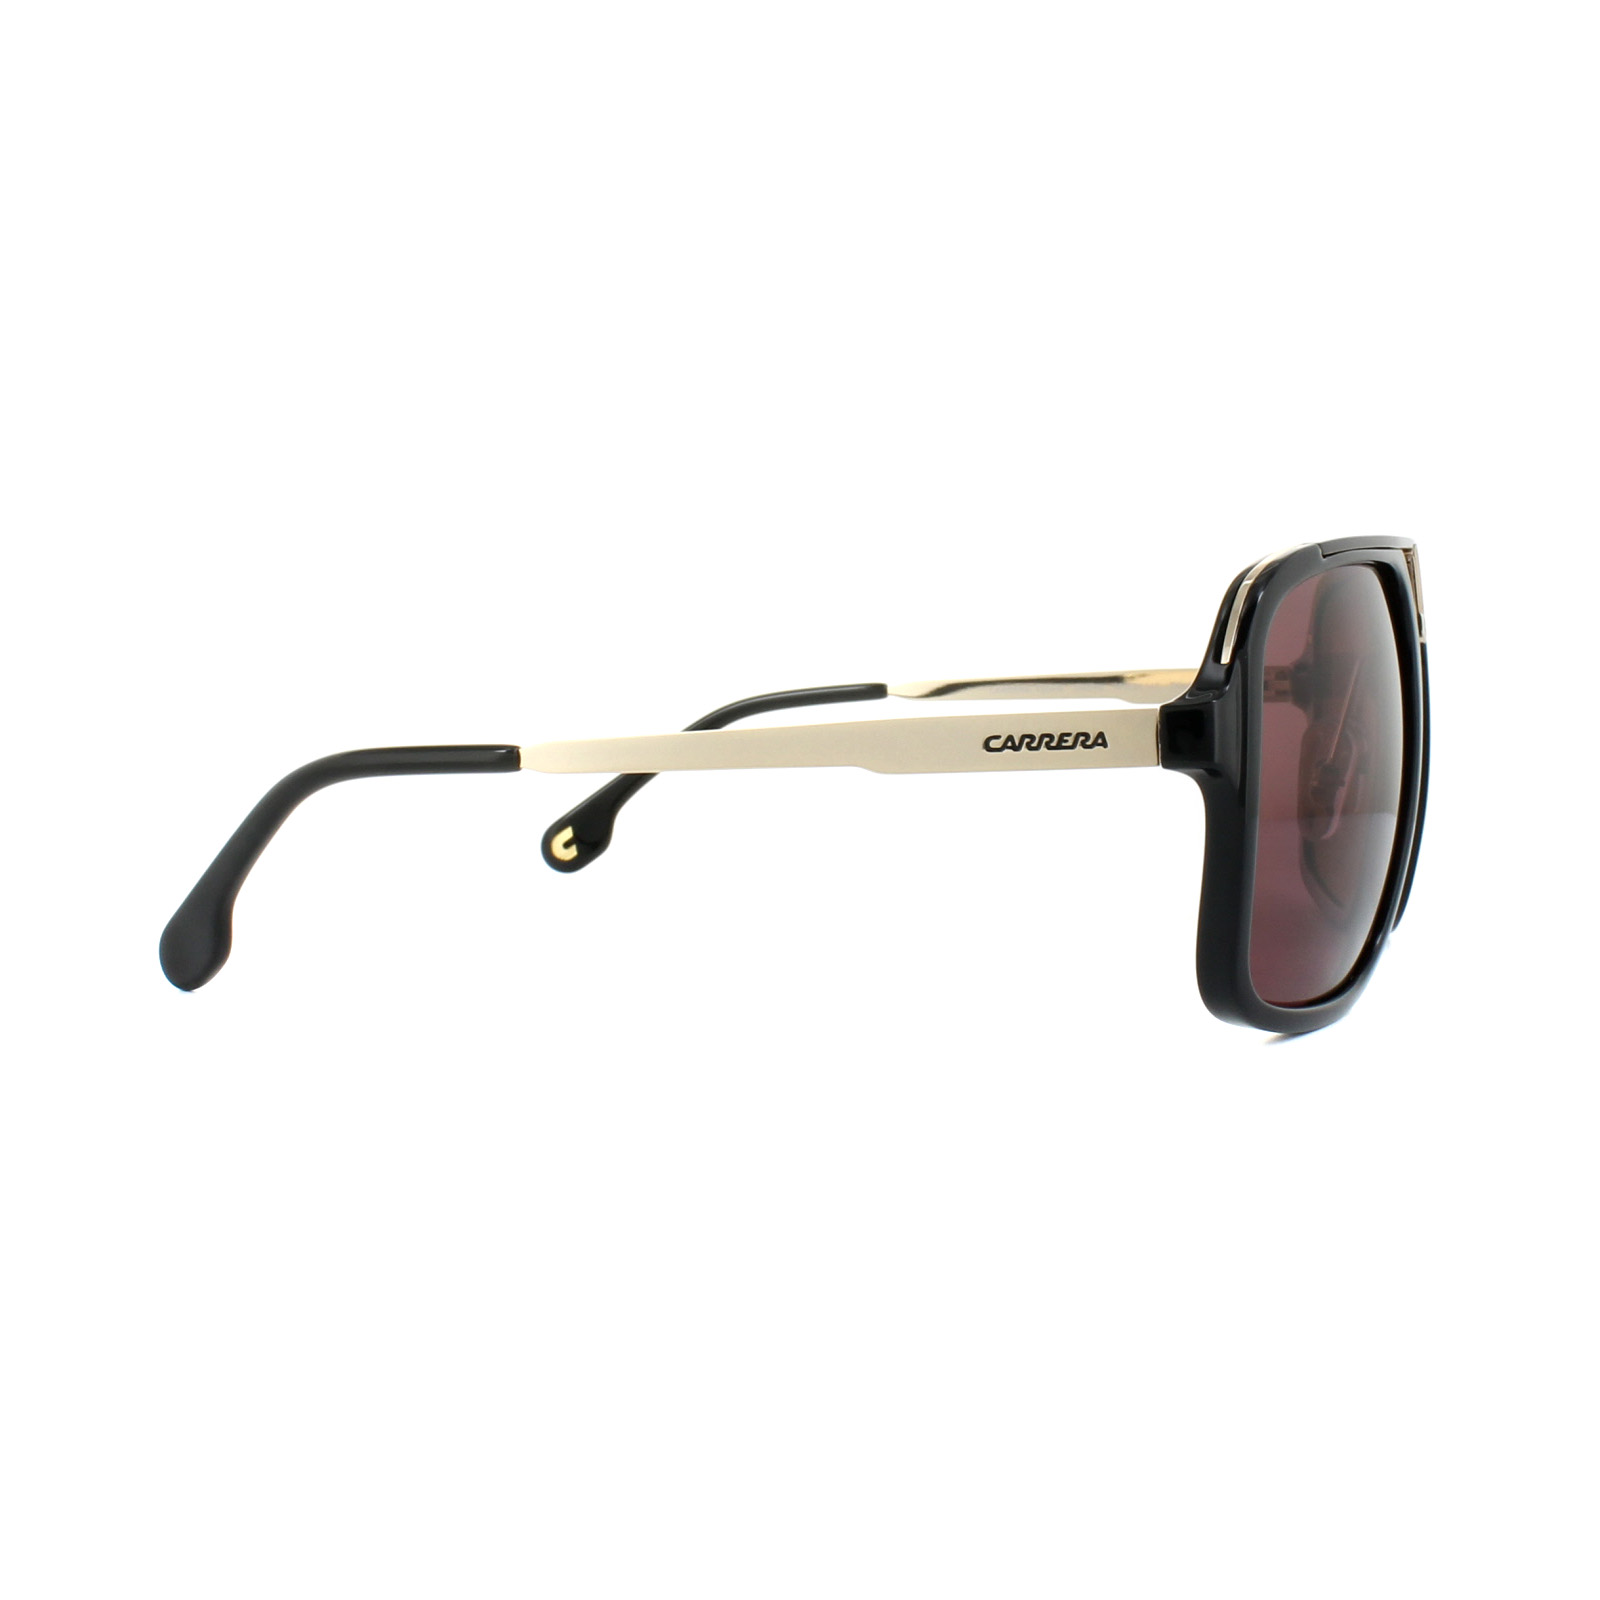 43acf1680b0 Sentinel Carrera Sunglasses 1004 S 2M2 W6 Black Gold Dark Pink Polarized